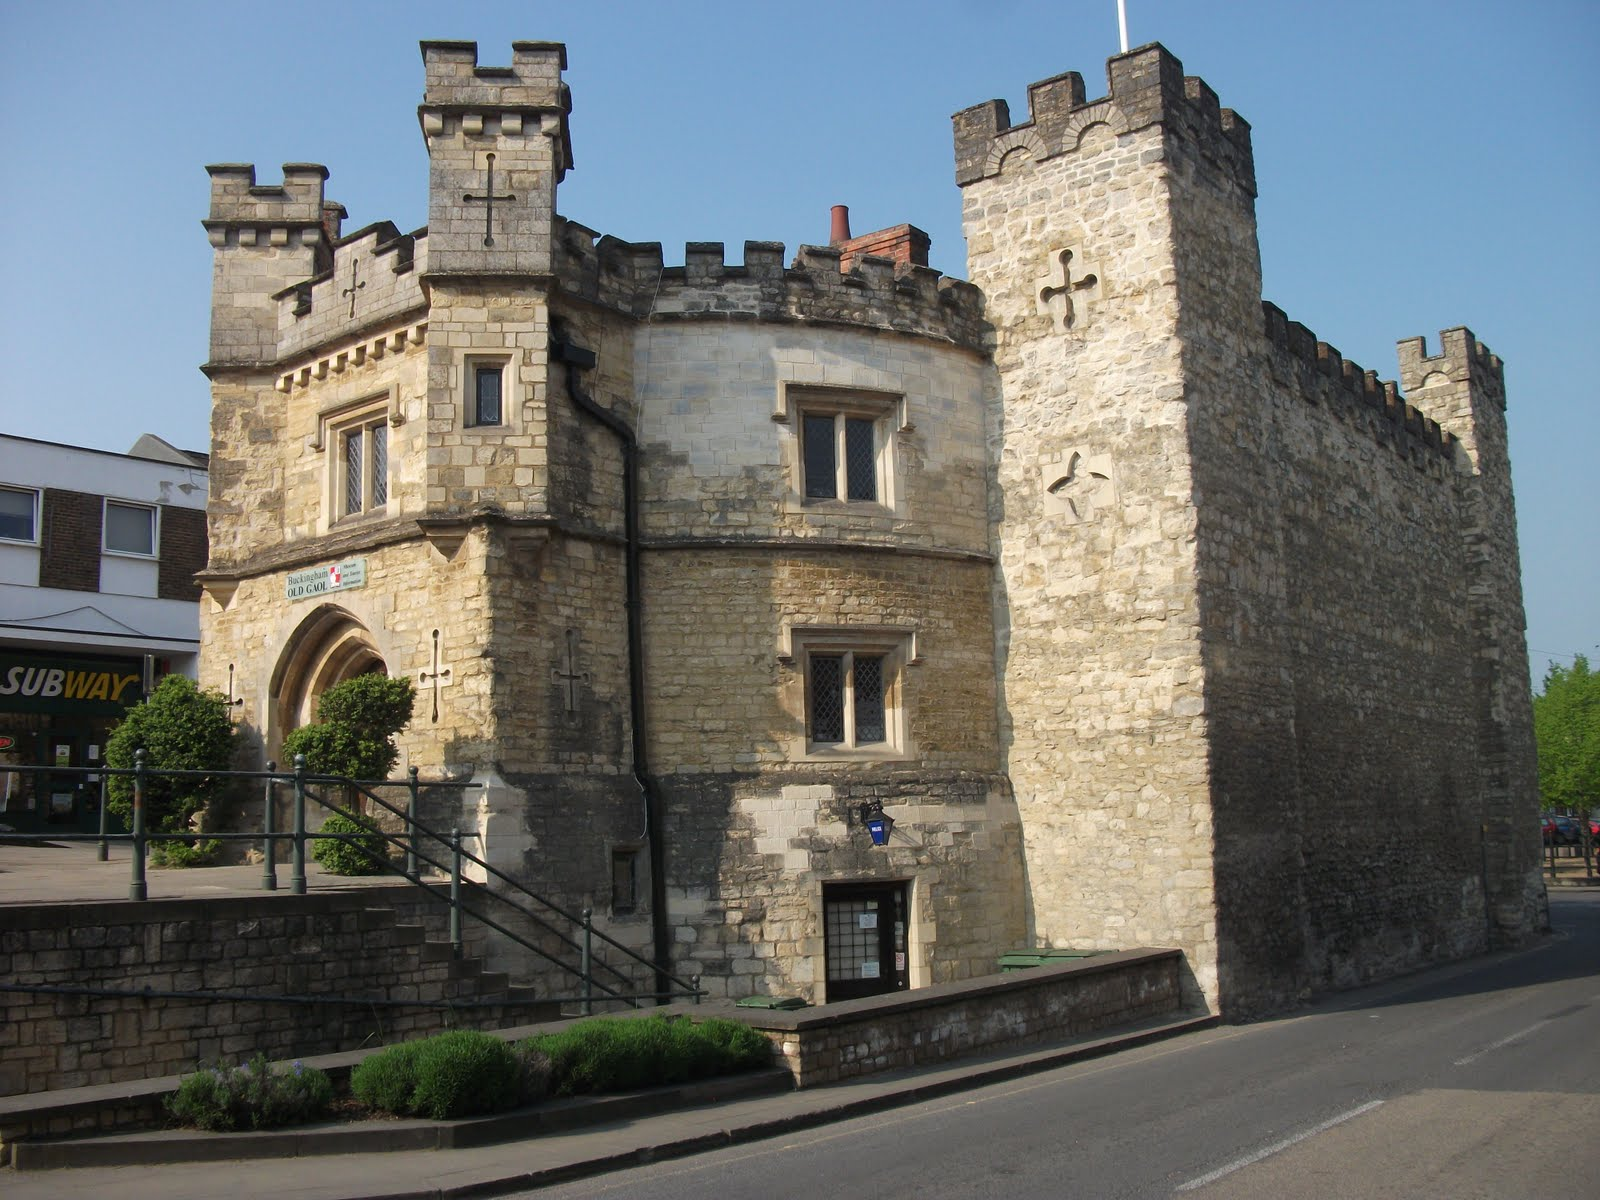 Getting Through Life: The University Of Buckingham